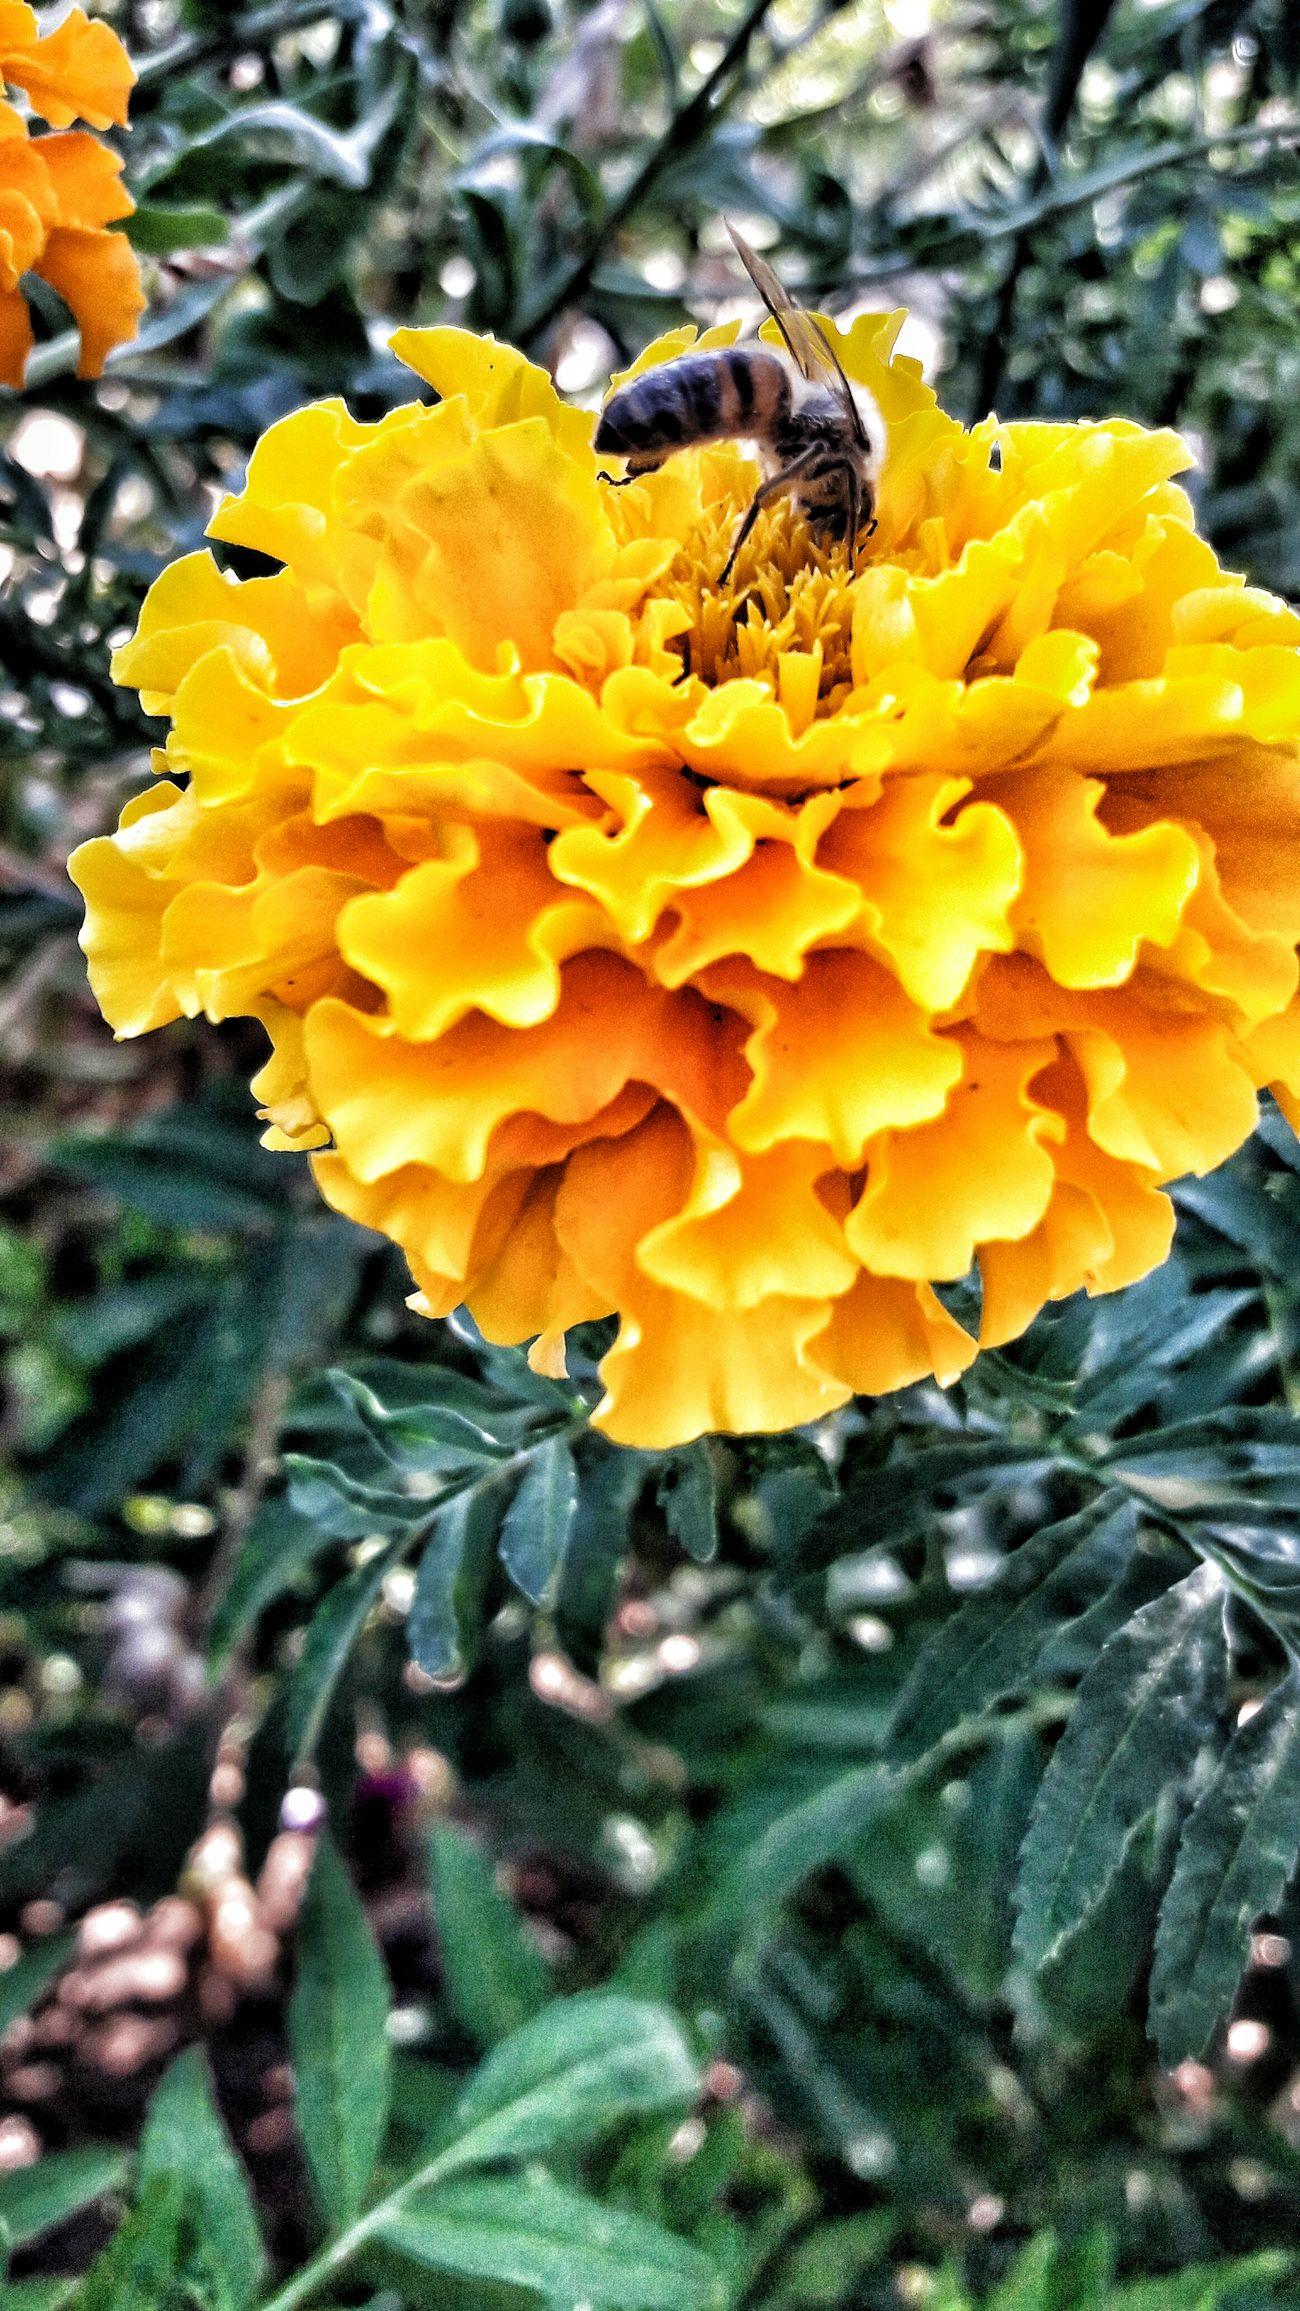 Wasp Wasps🐝 Internal Flower Photo Photography EyeEm Gallery Life Pollen Honey